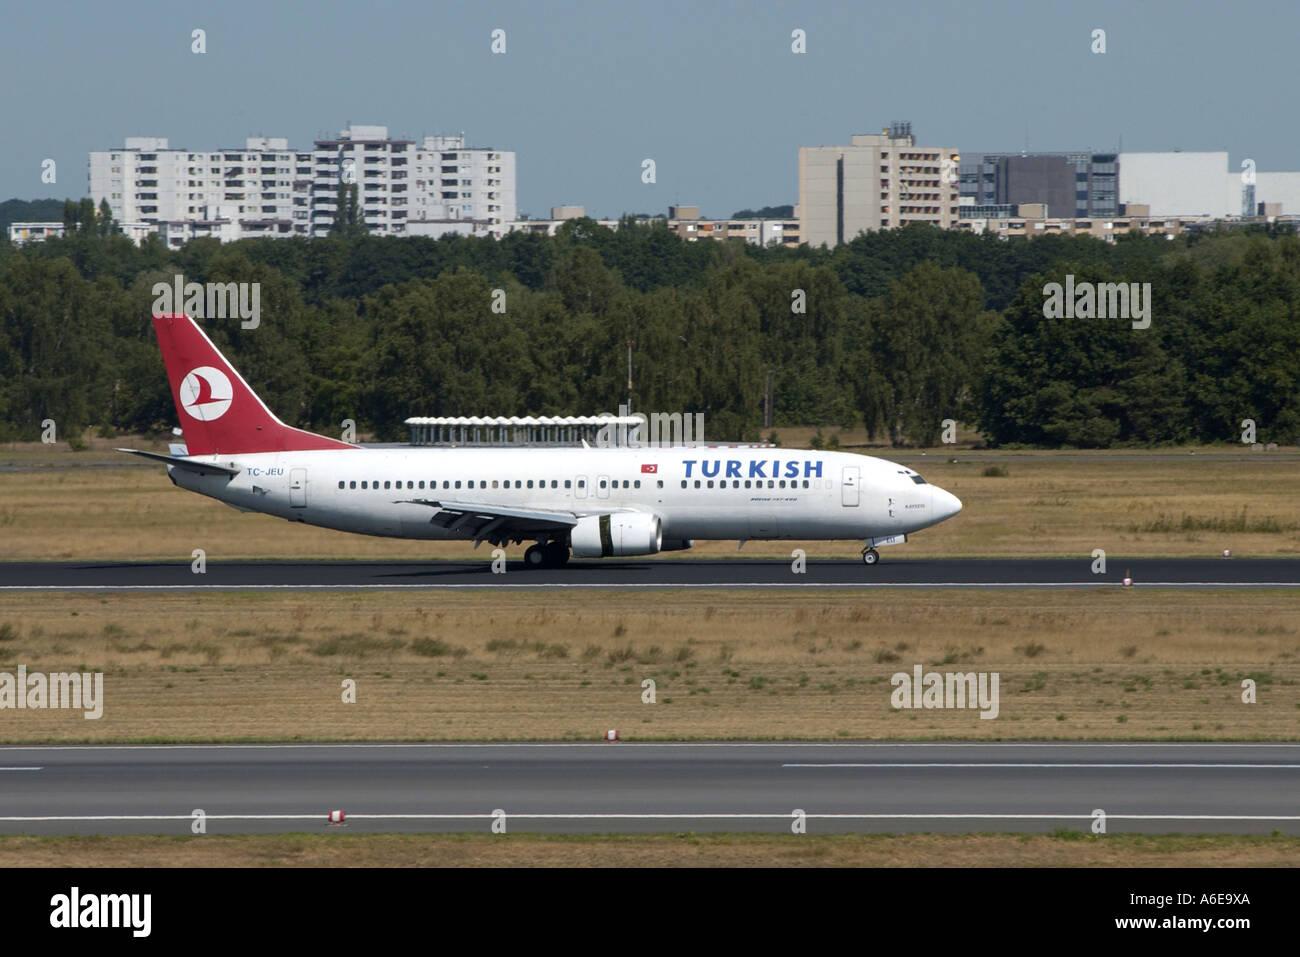 Turkish Airways airplane at Tegel airport, Berlin - Stock Image